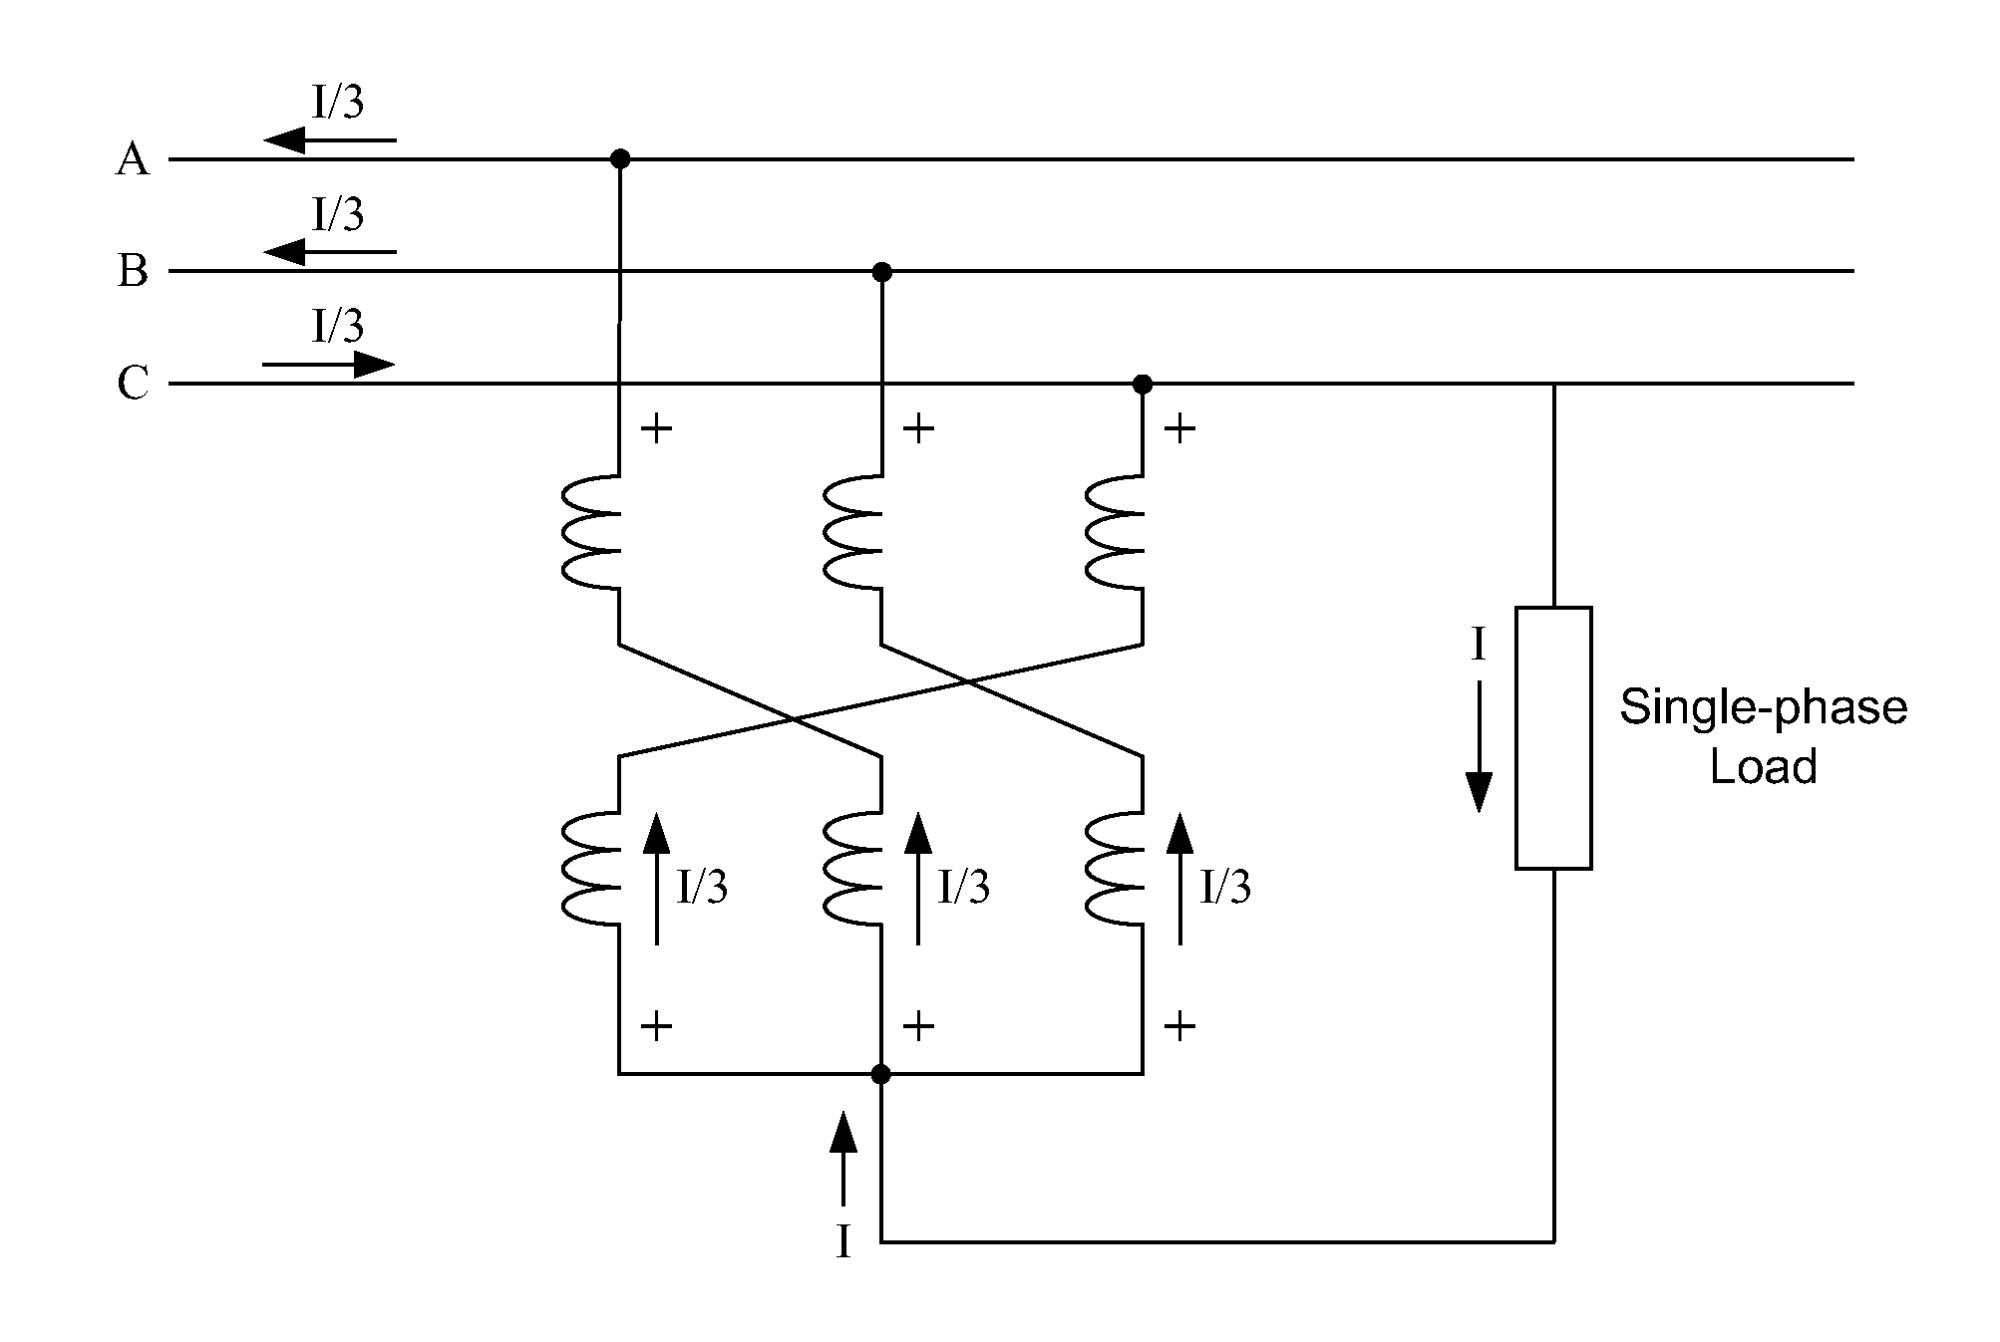 hight resolution of zig zag transformer wiring diagram simple wiring post rh 35 asiagourmet igb de home generator wiring diagram ac generator wiring diagram